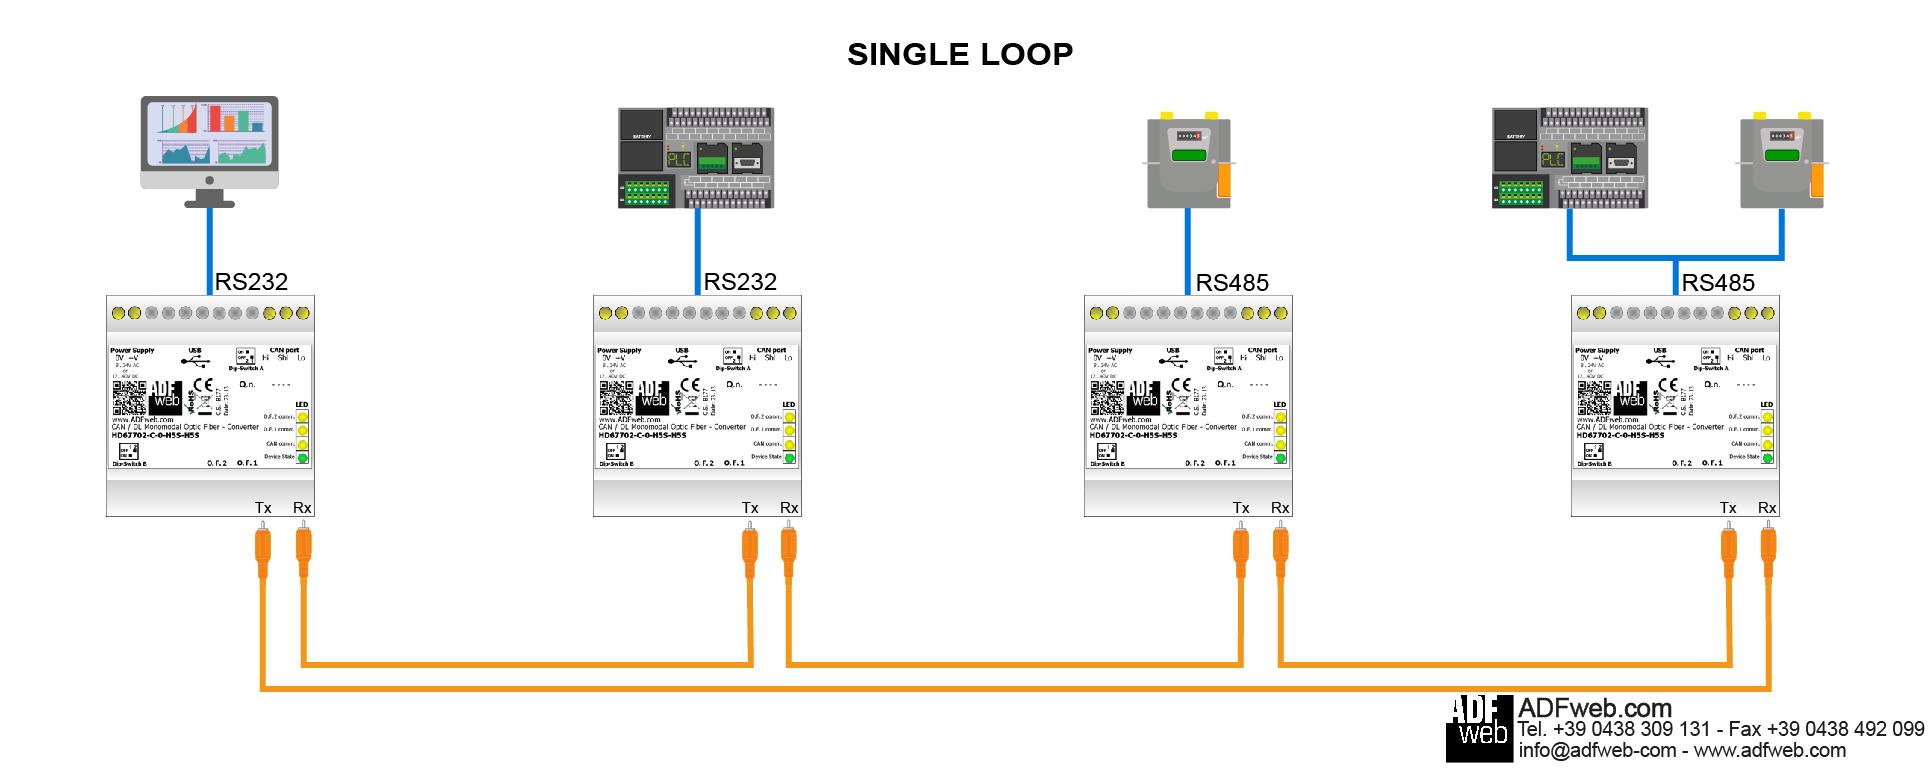 Ms Tp Wiring Diagram Auto Electrical John Deere 8960